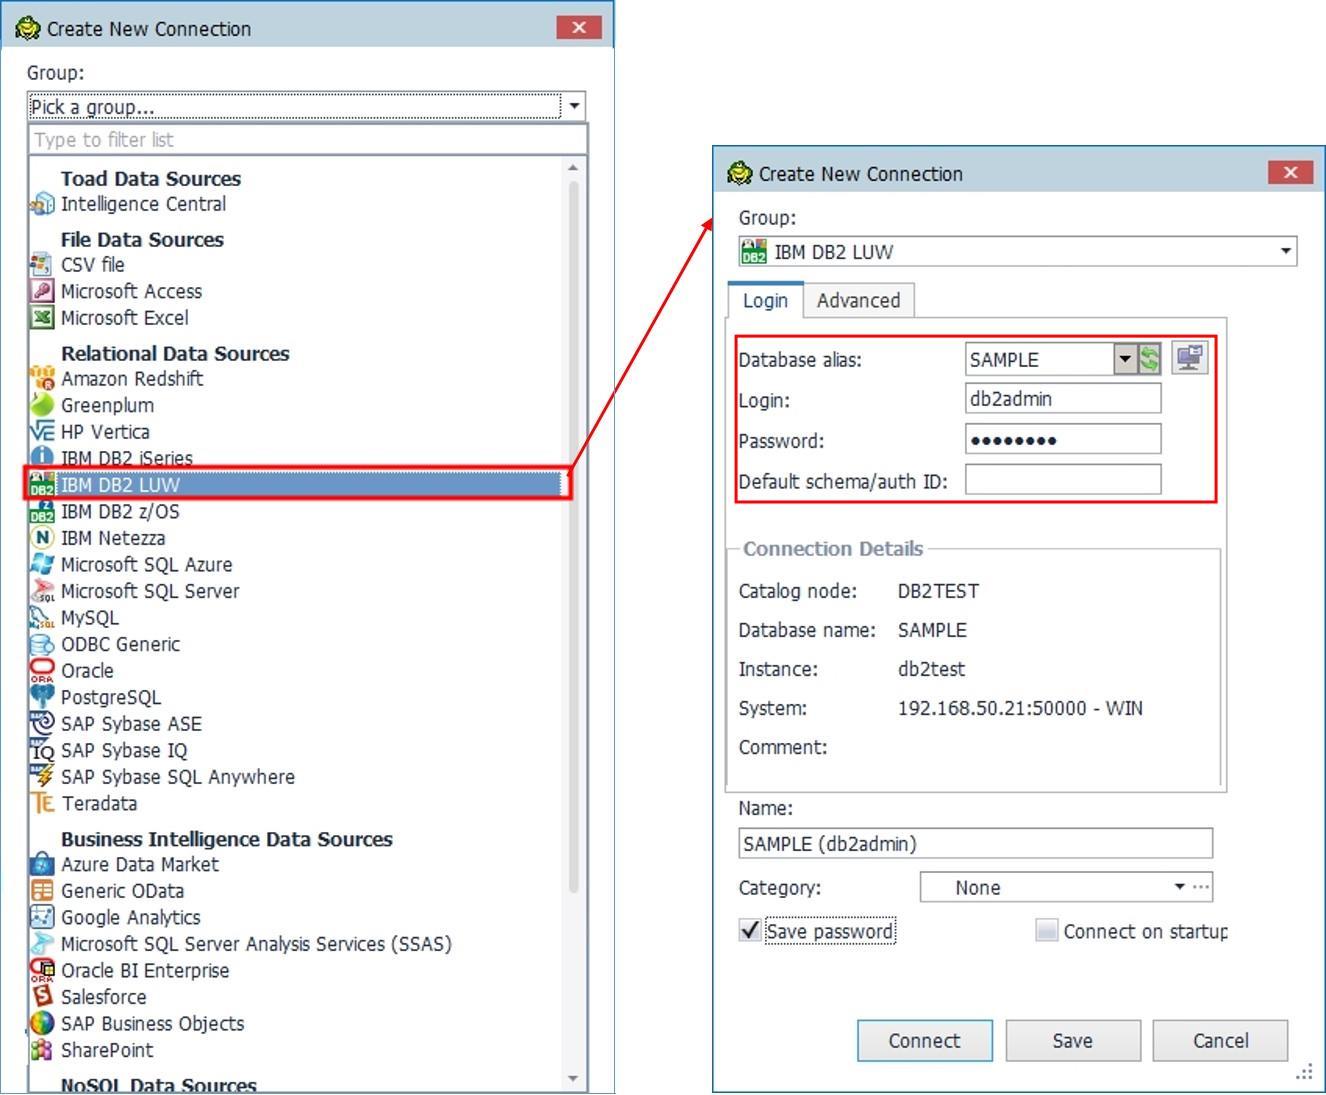 Toad Data Point 새로 접속하는 DB2 접속 정보 입력